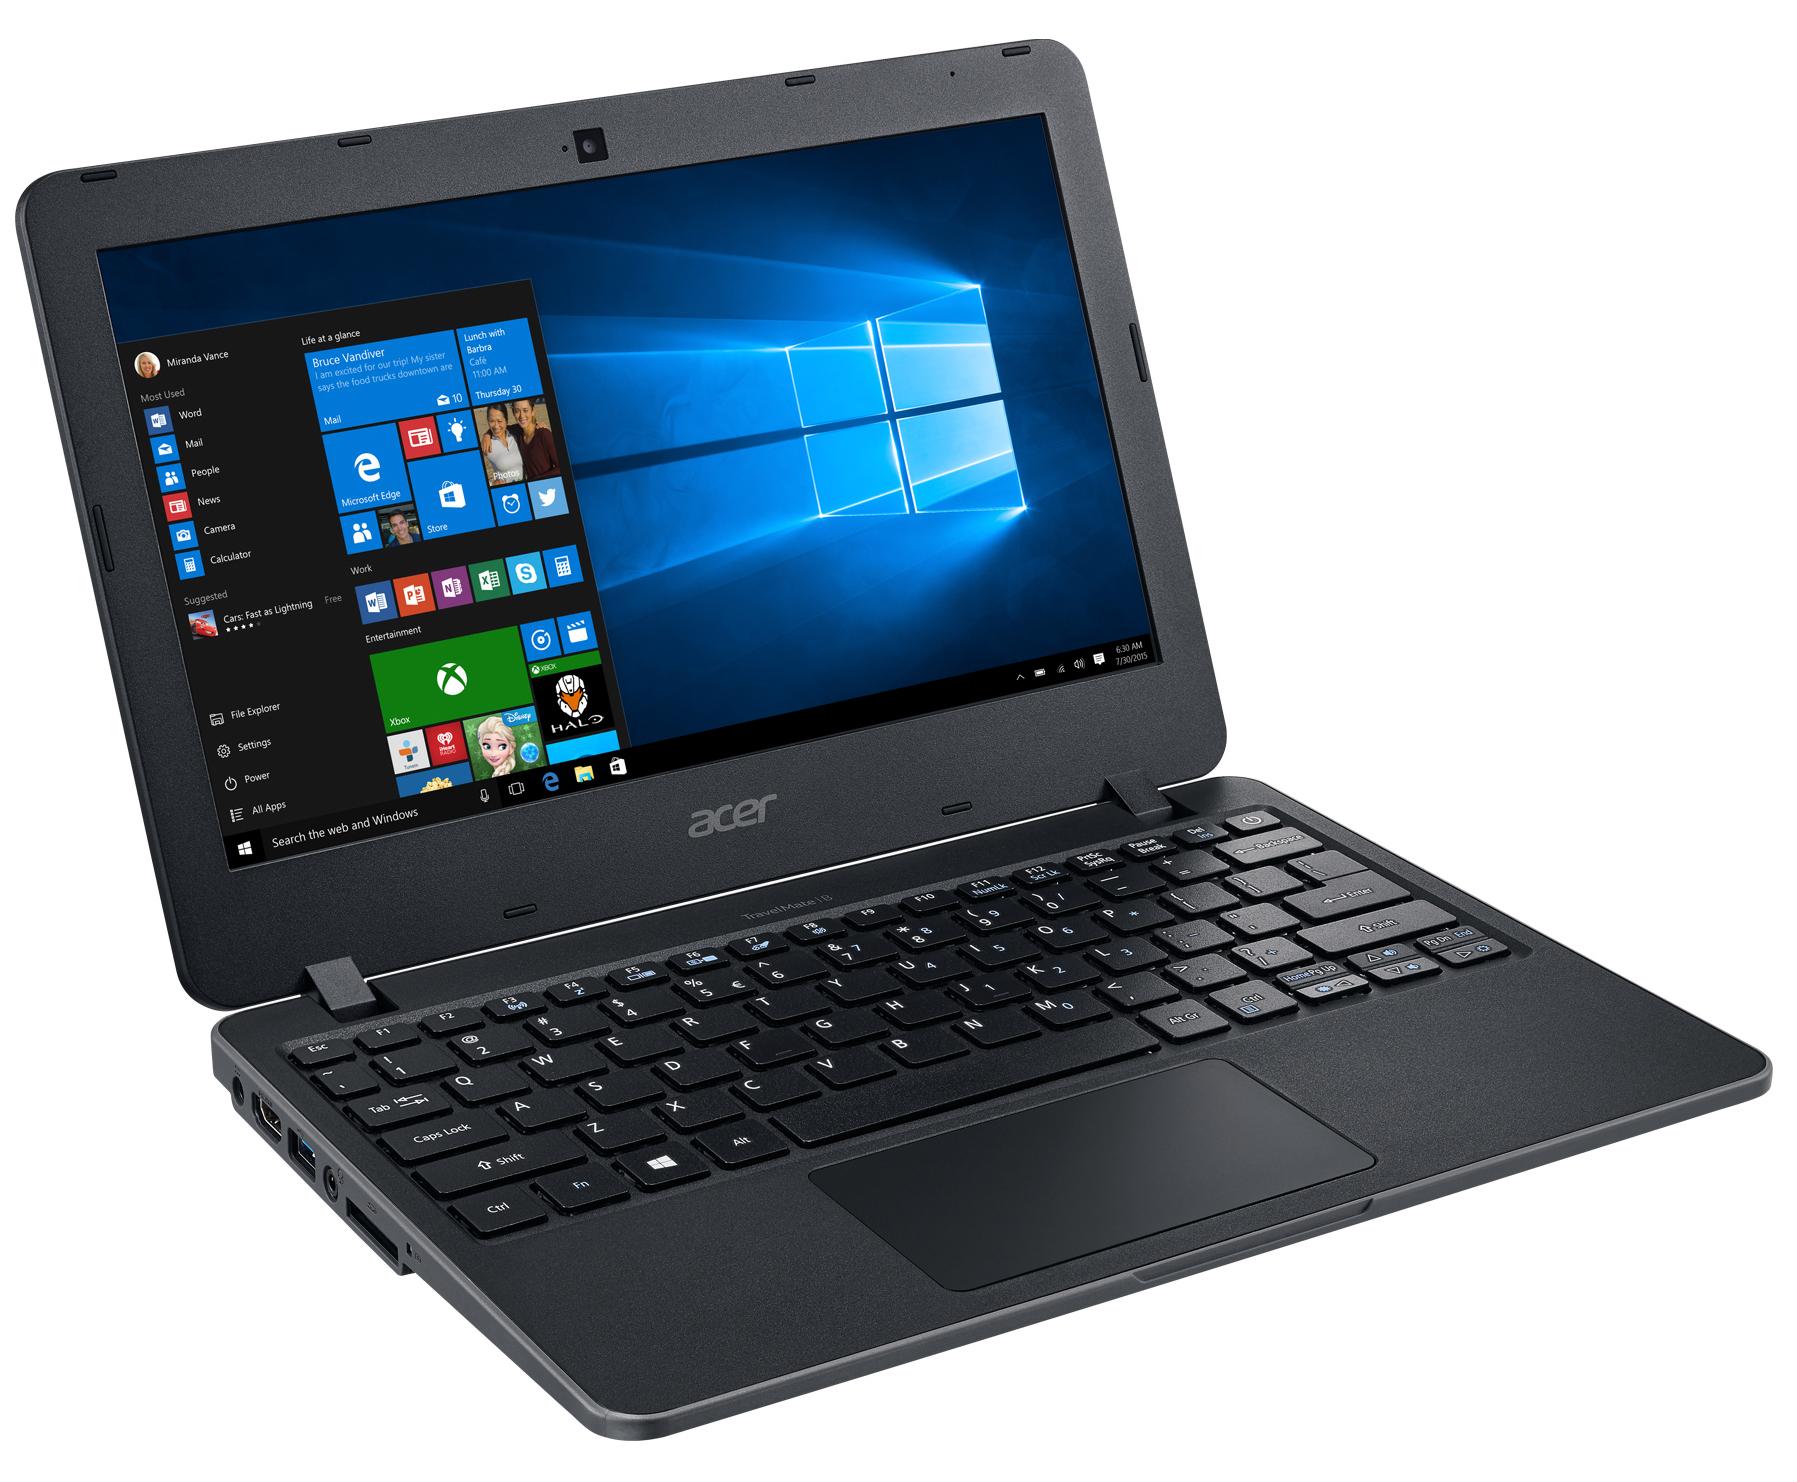 Acer TravelMate B117-MP Intel DPTF Windows 8 X64